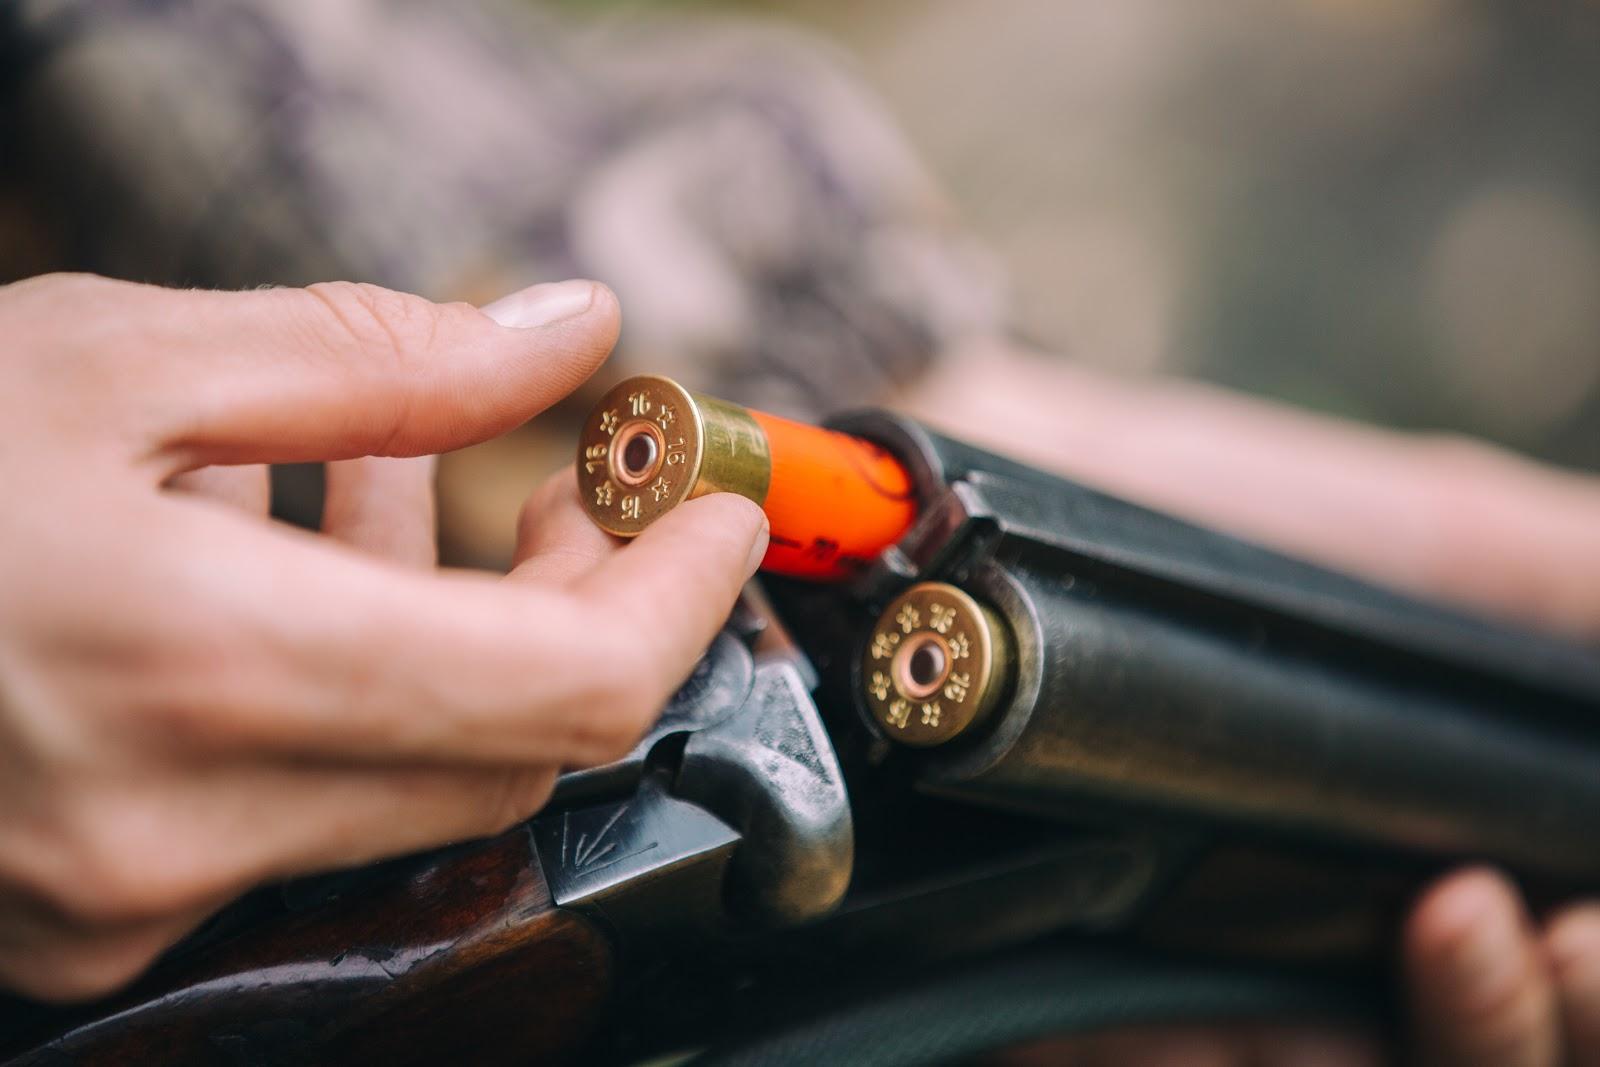 reloading a shotgun